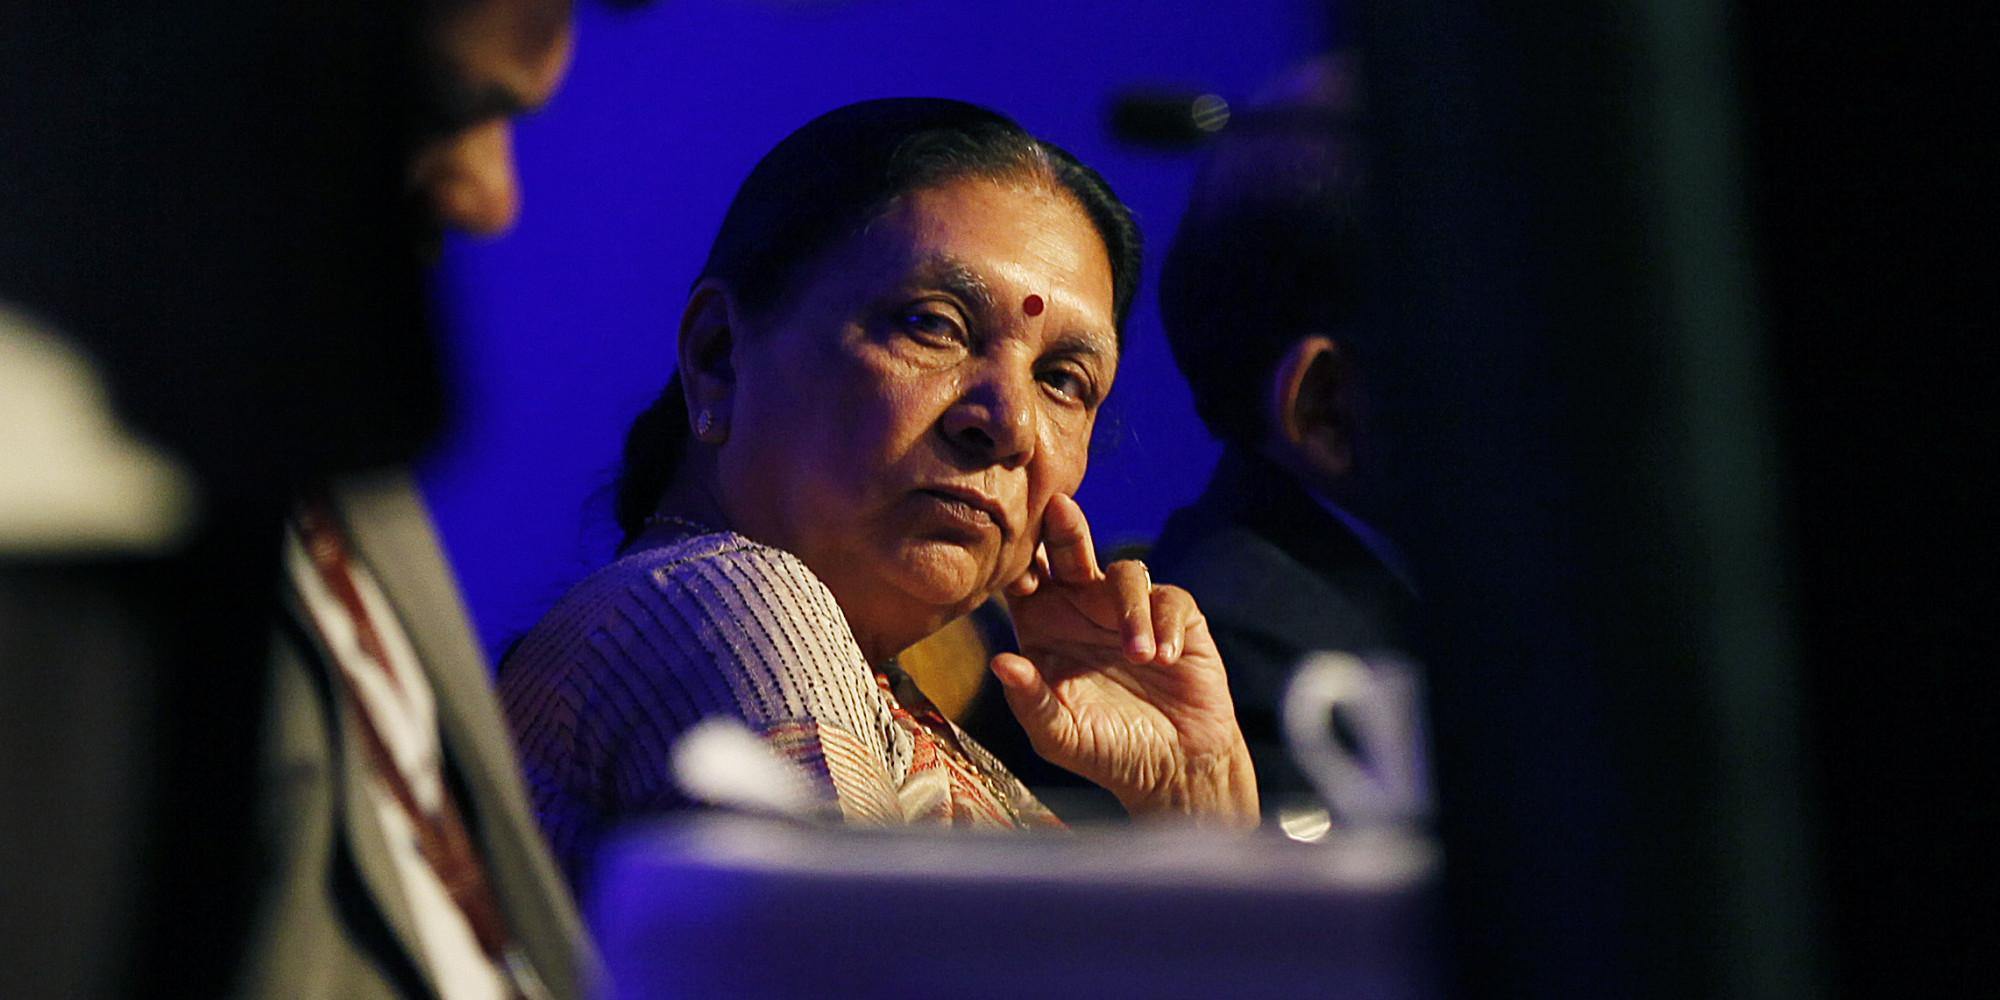 Gujarat Chief Minister Anandiben Patel At Vibrant Gujarat Curtain Raiser